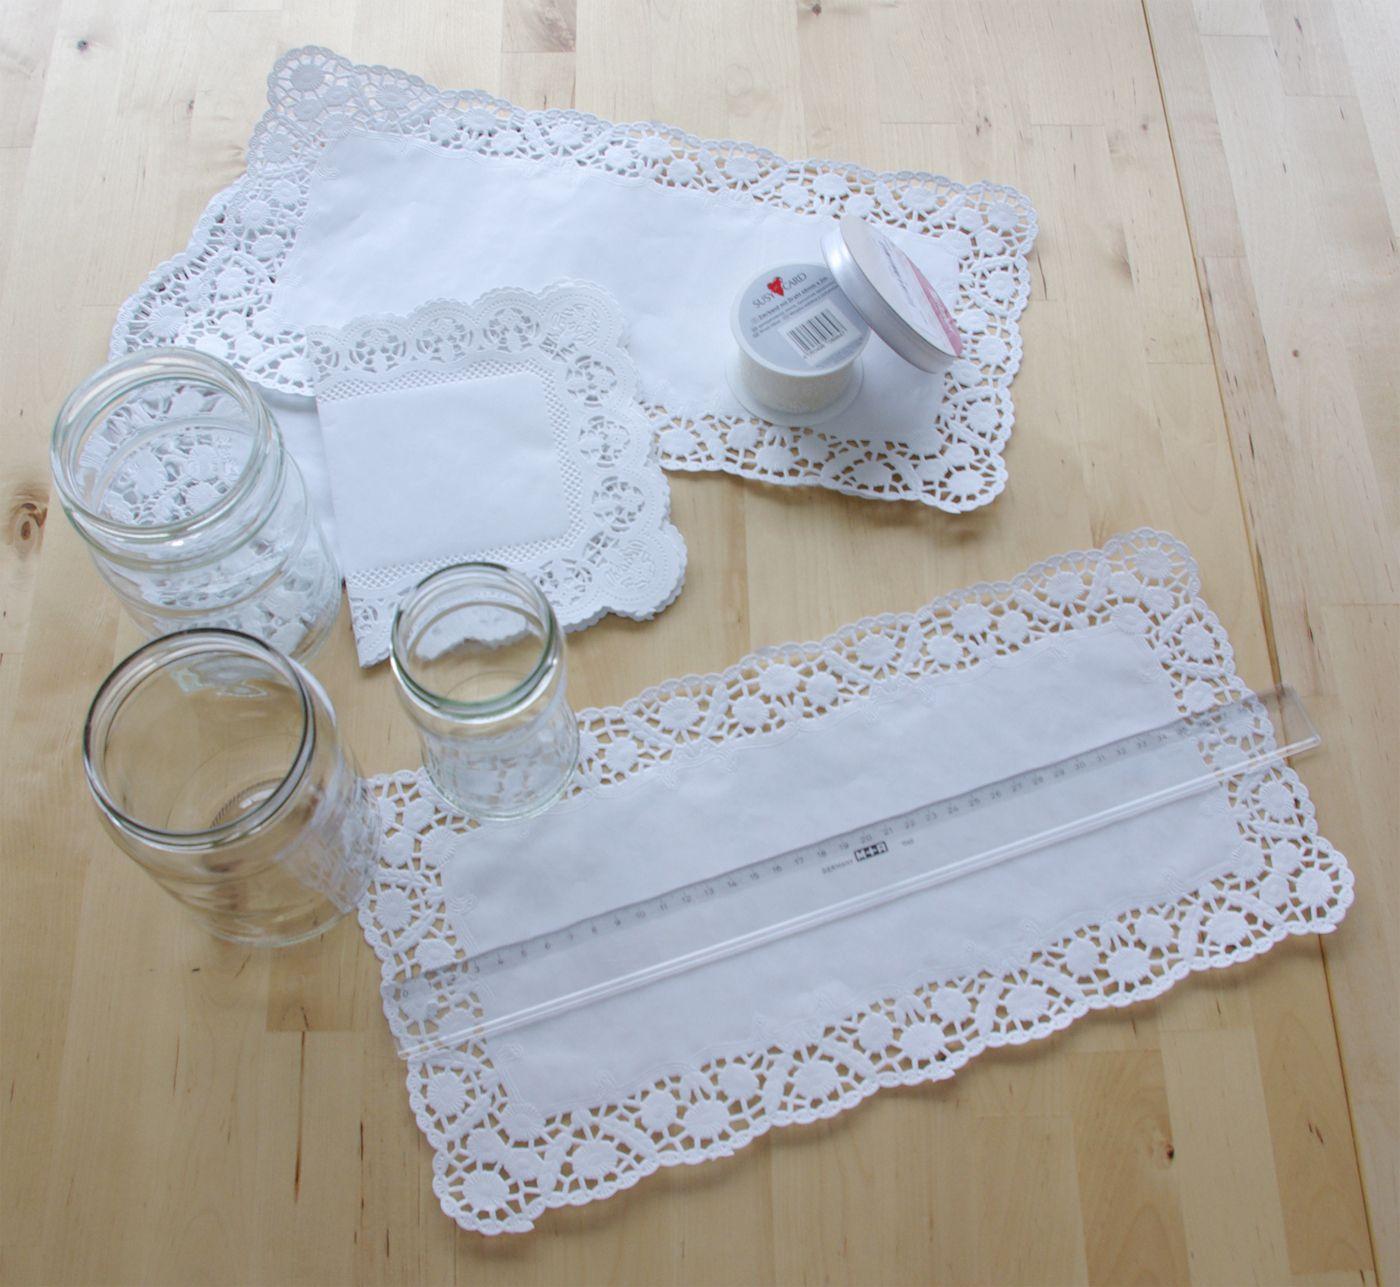 Hochzeits special windlichter kerzen deko glas spitze diy for Deko ideen kerzen im glas